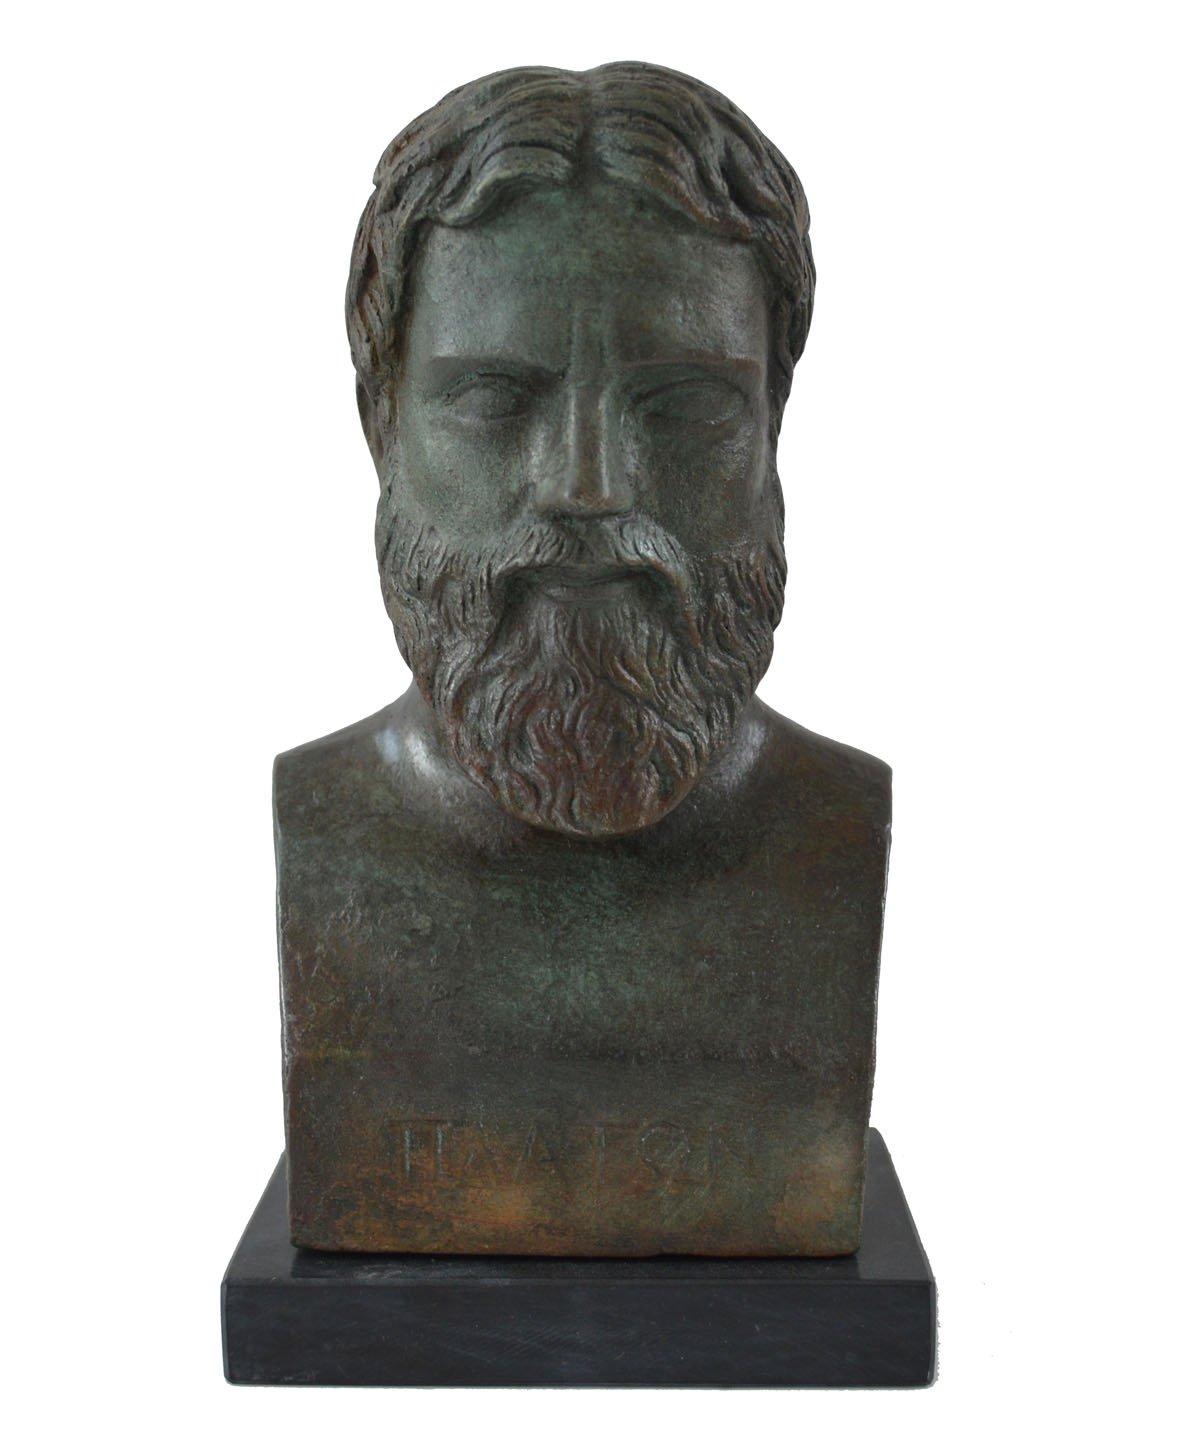 Plato Bust with bronze color effect - Greek Philosopher student of Socrates - Platonas